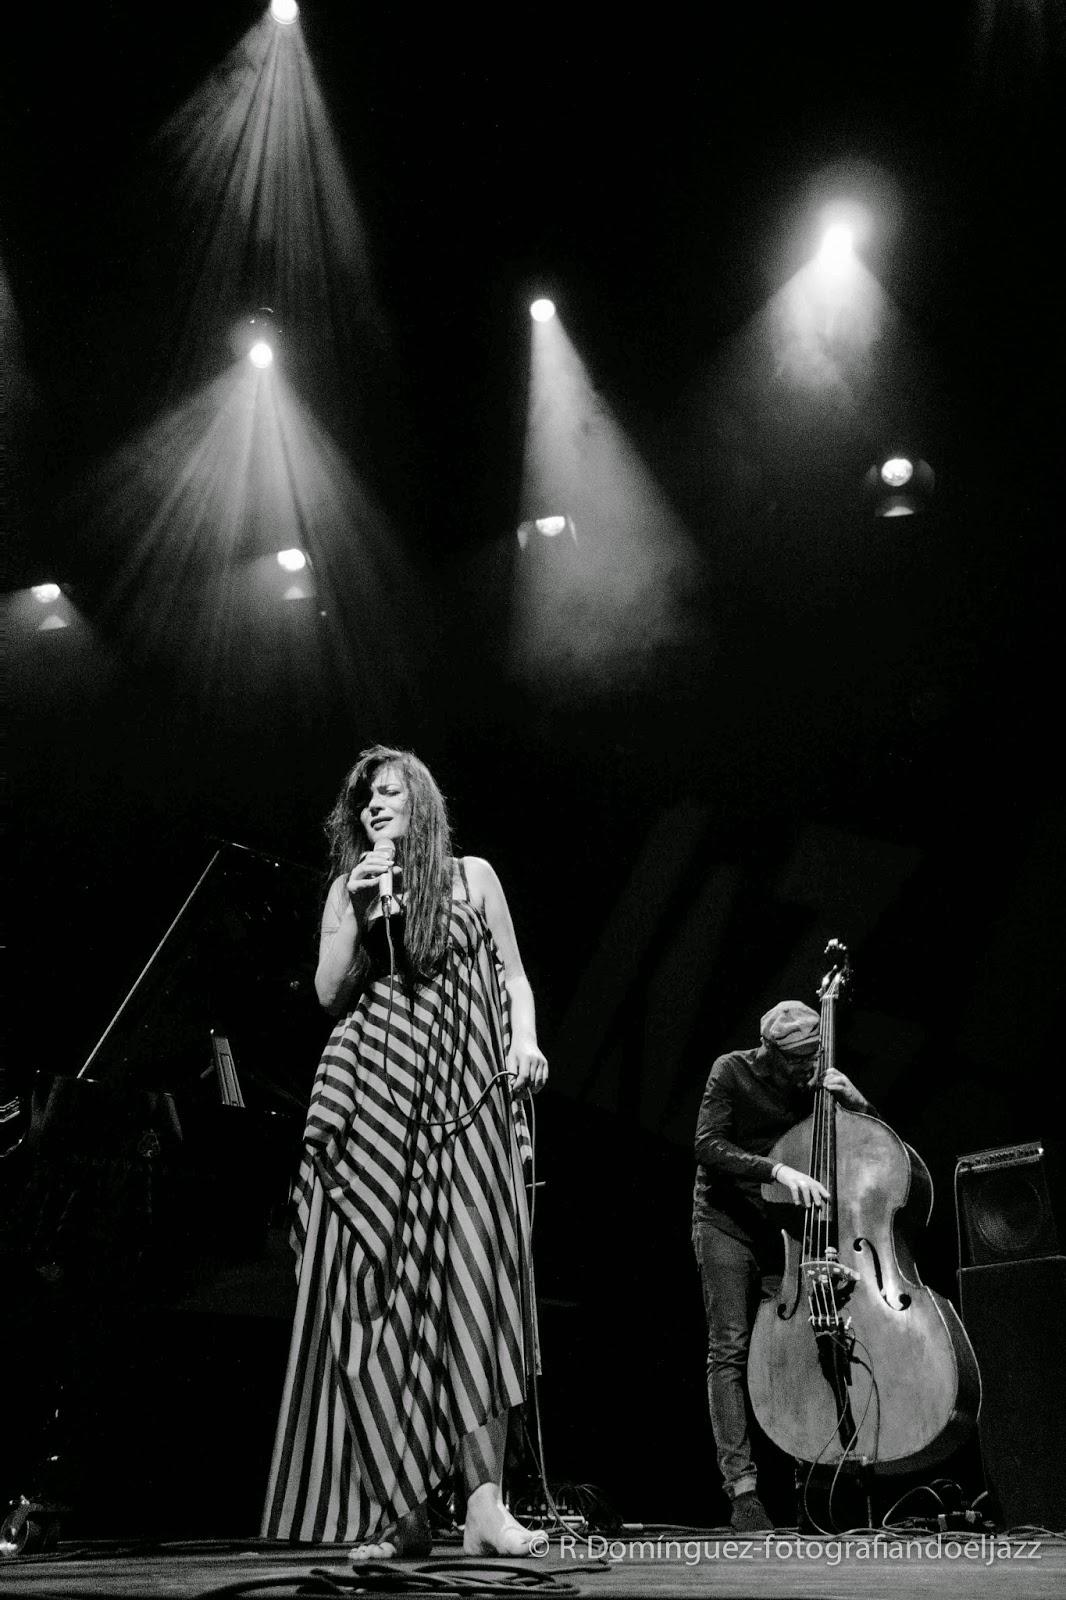 © R.Domínguez - Elina Duni Quartet - Patrice Moret - Elina Duni